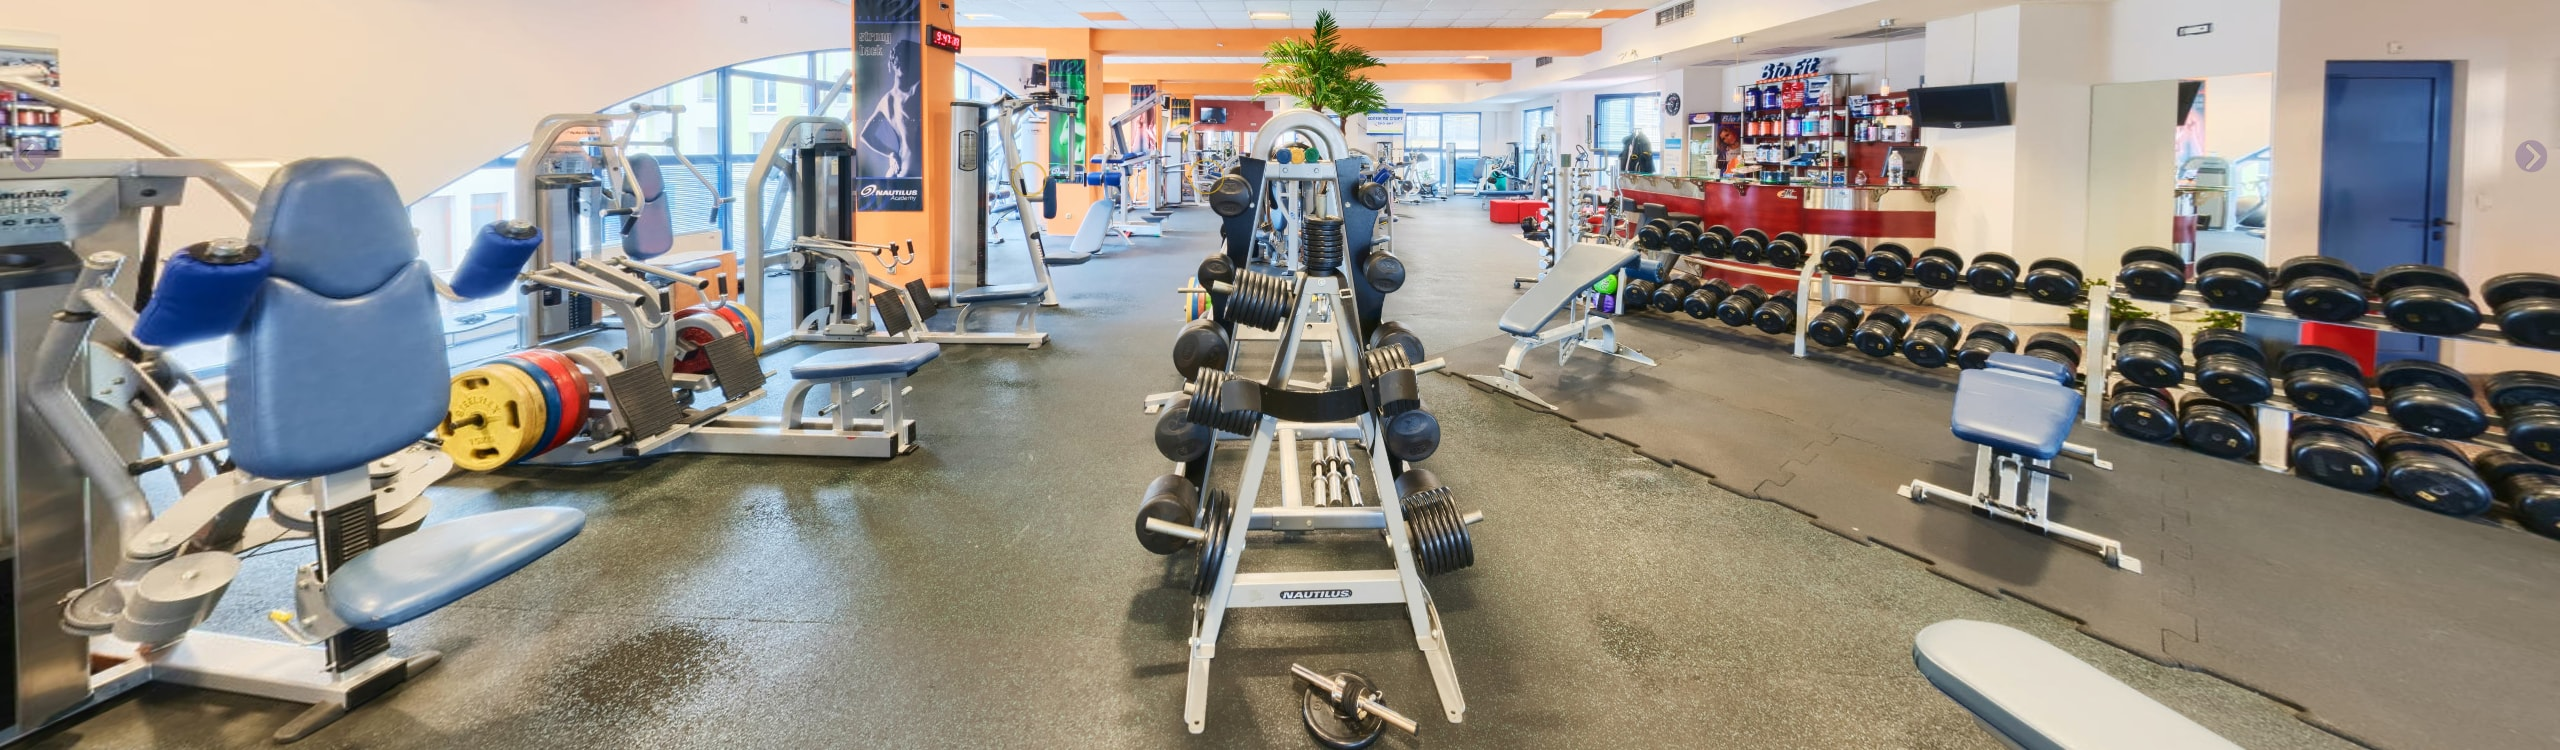 "Зала за силов фитнес — JK Fitness Gym — Сектор ""Свободни тежести"""